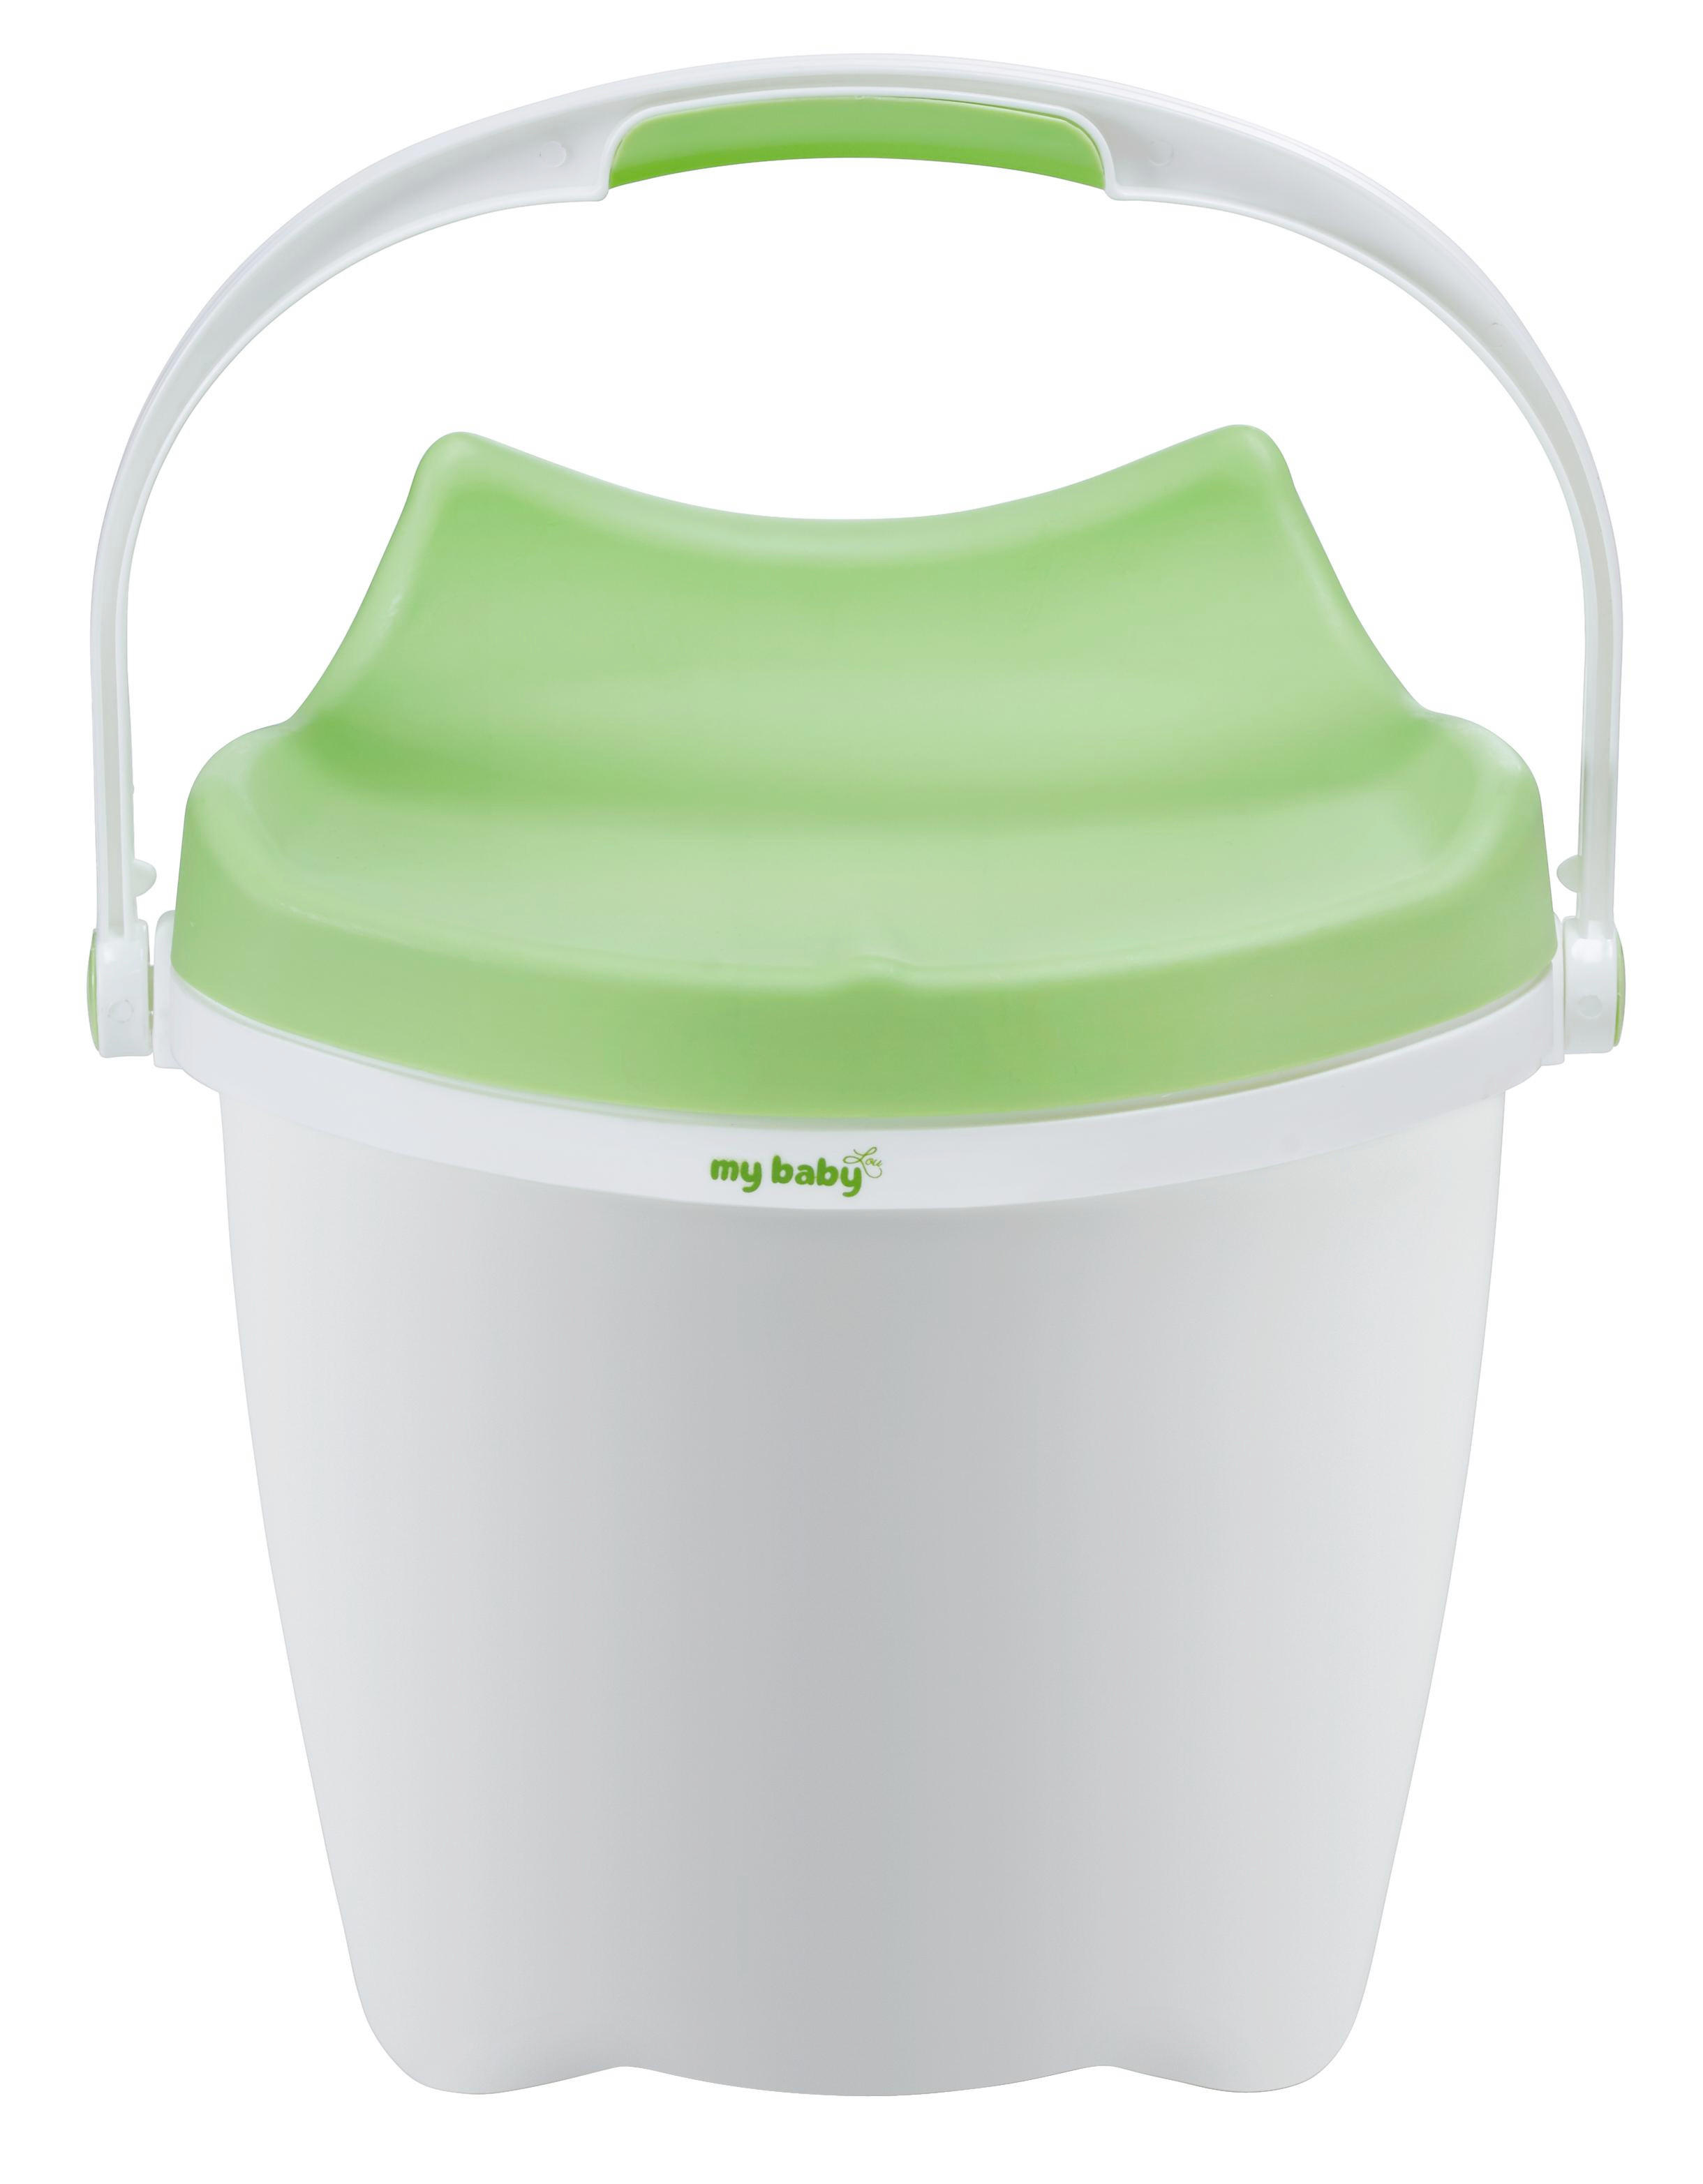 BLÖJHINK - vit/grön, Basics, plast (37/28/38cm) - My Baby Lou